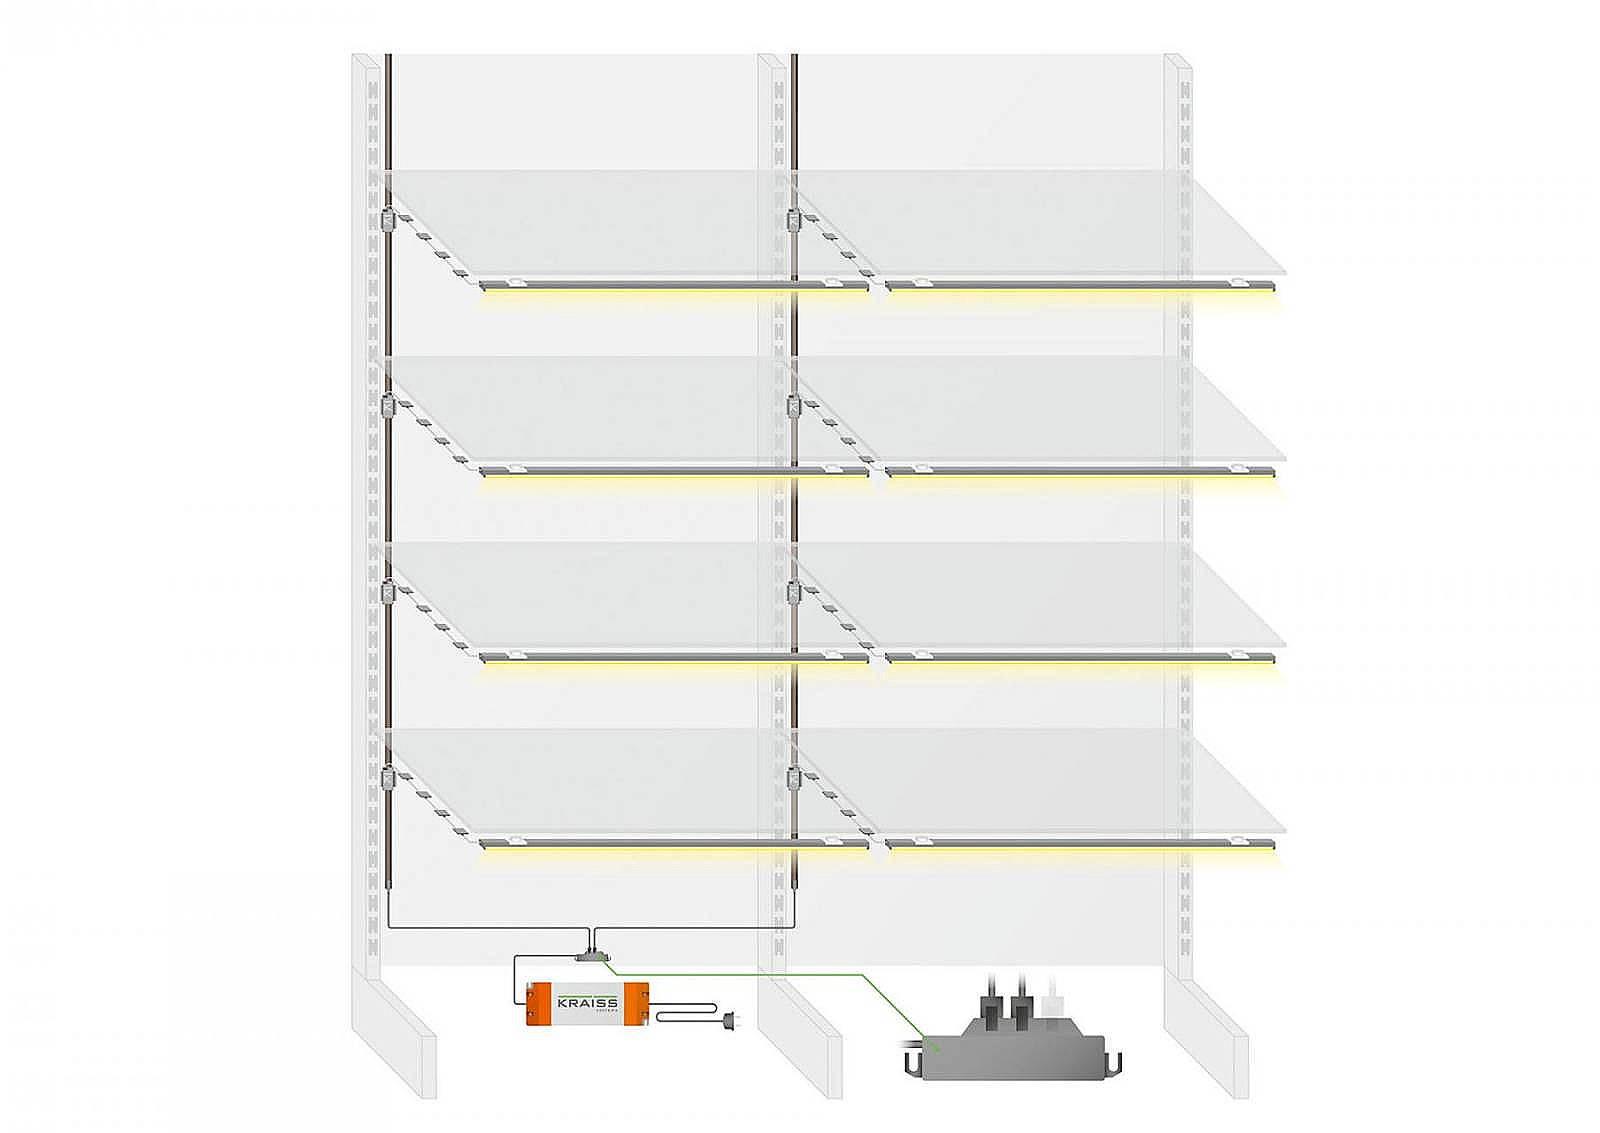 System simple - KRAISS systems